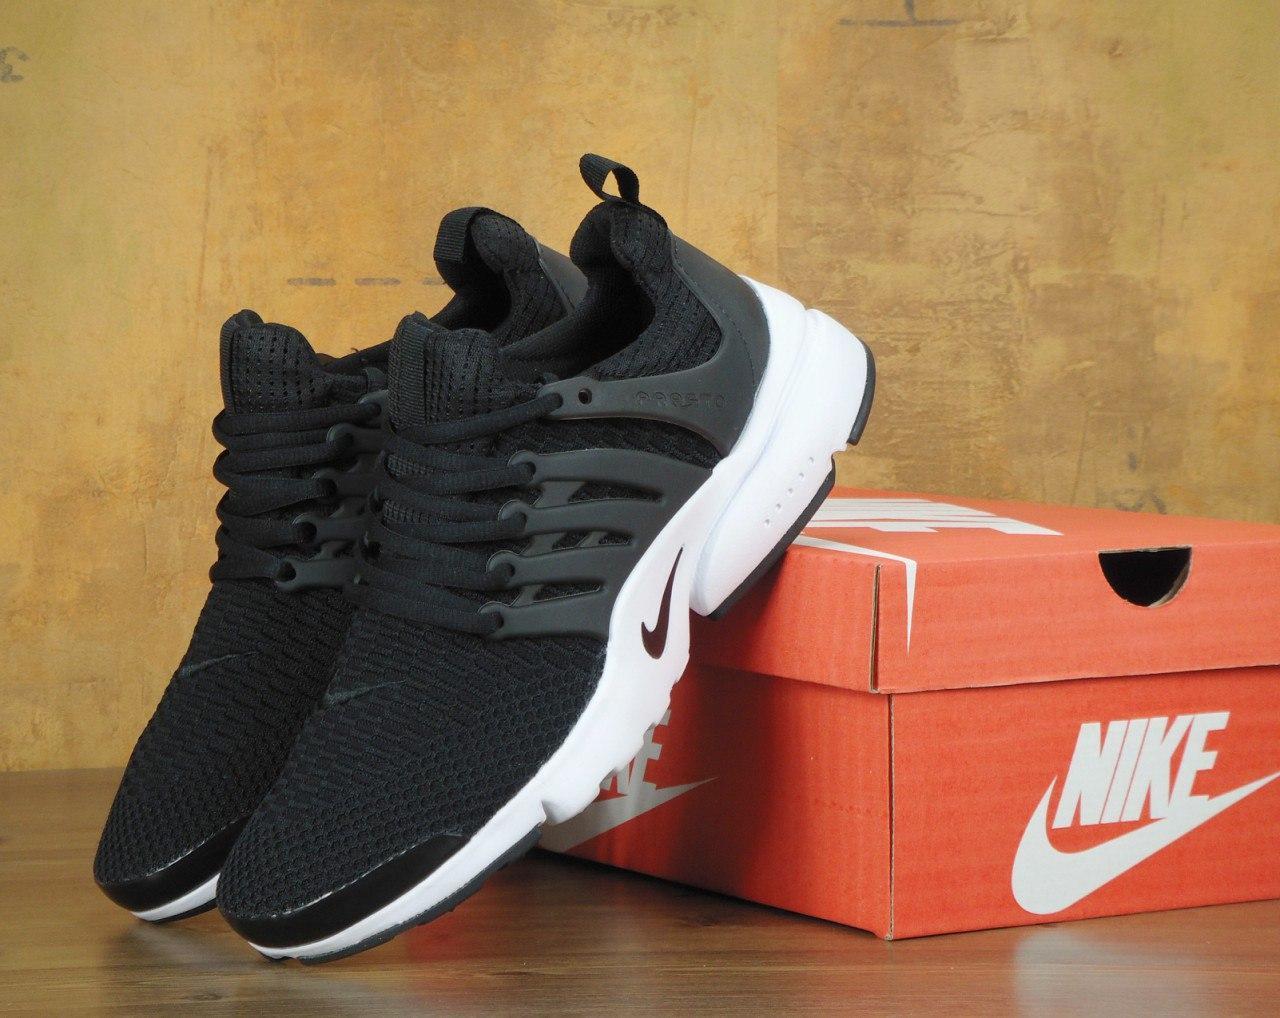 Кроссовки Nike Air Presto Flyknit Black/White. Живое фото. Топ качество! (Реплика ААА+)